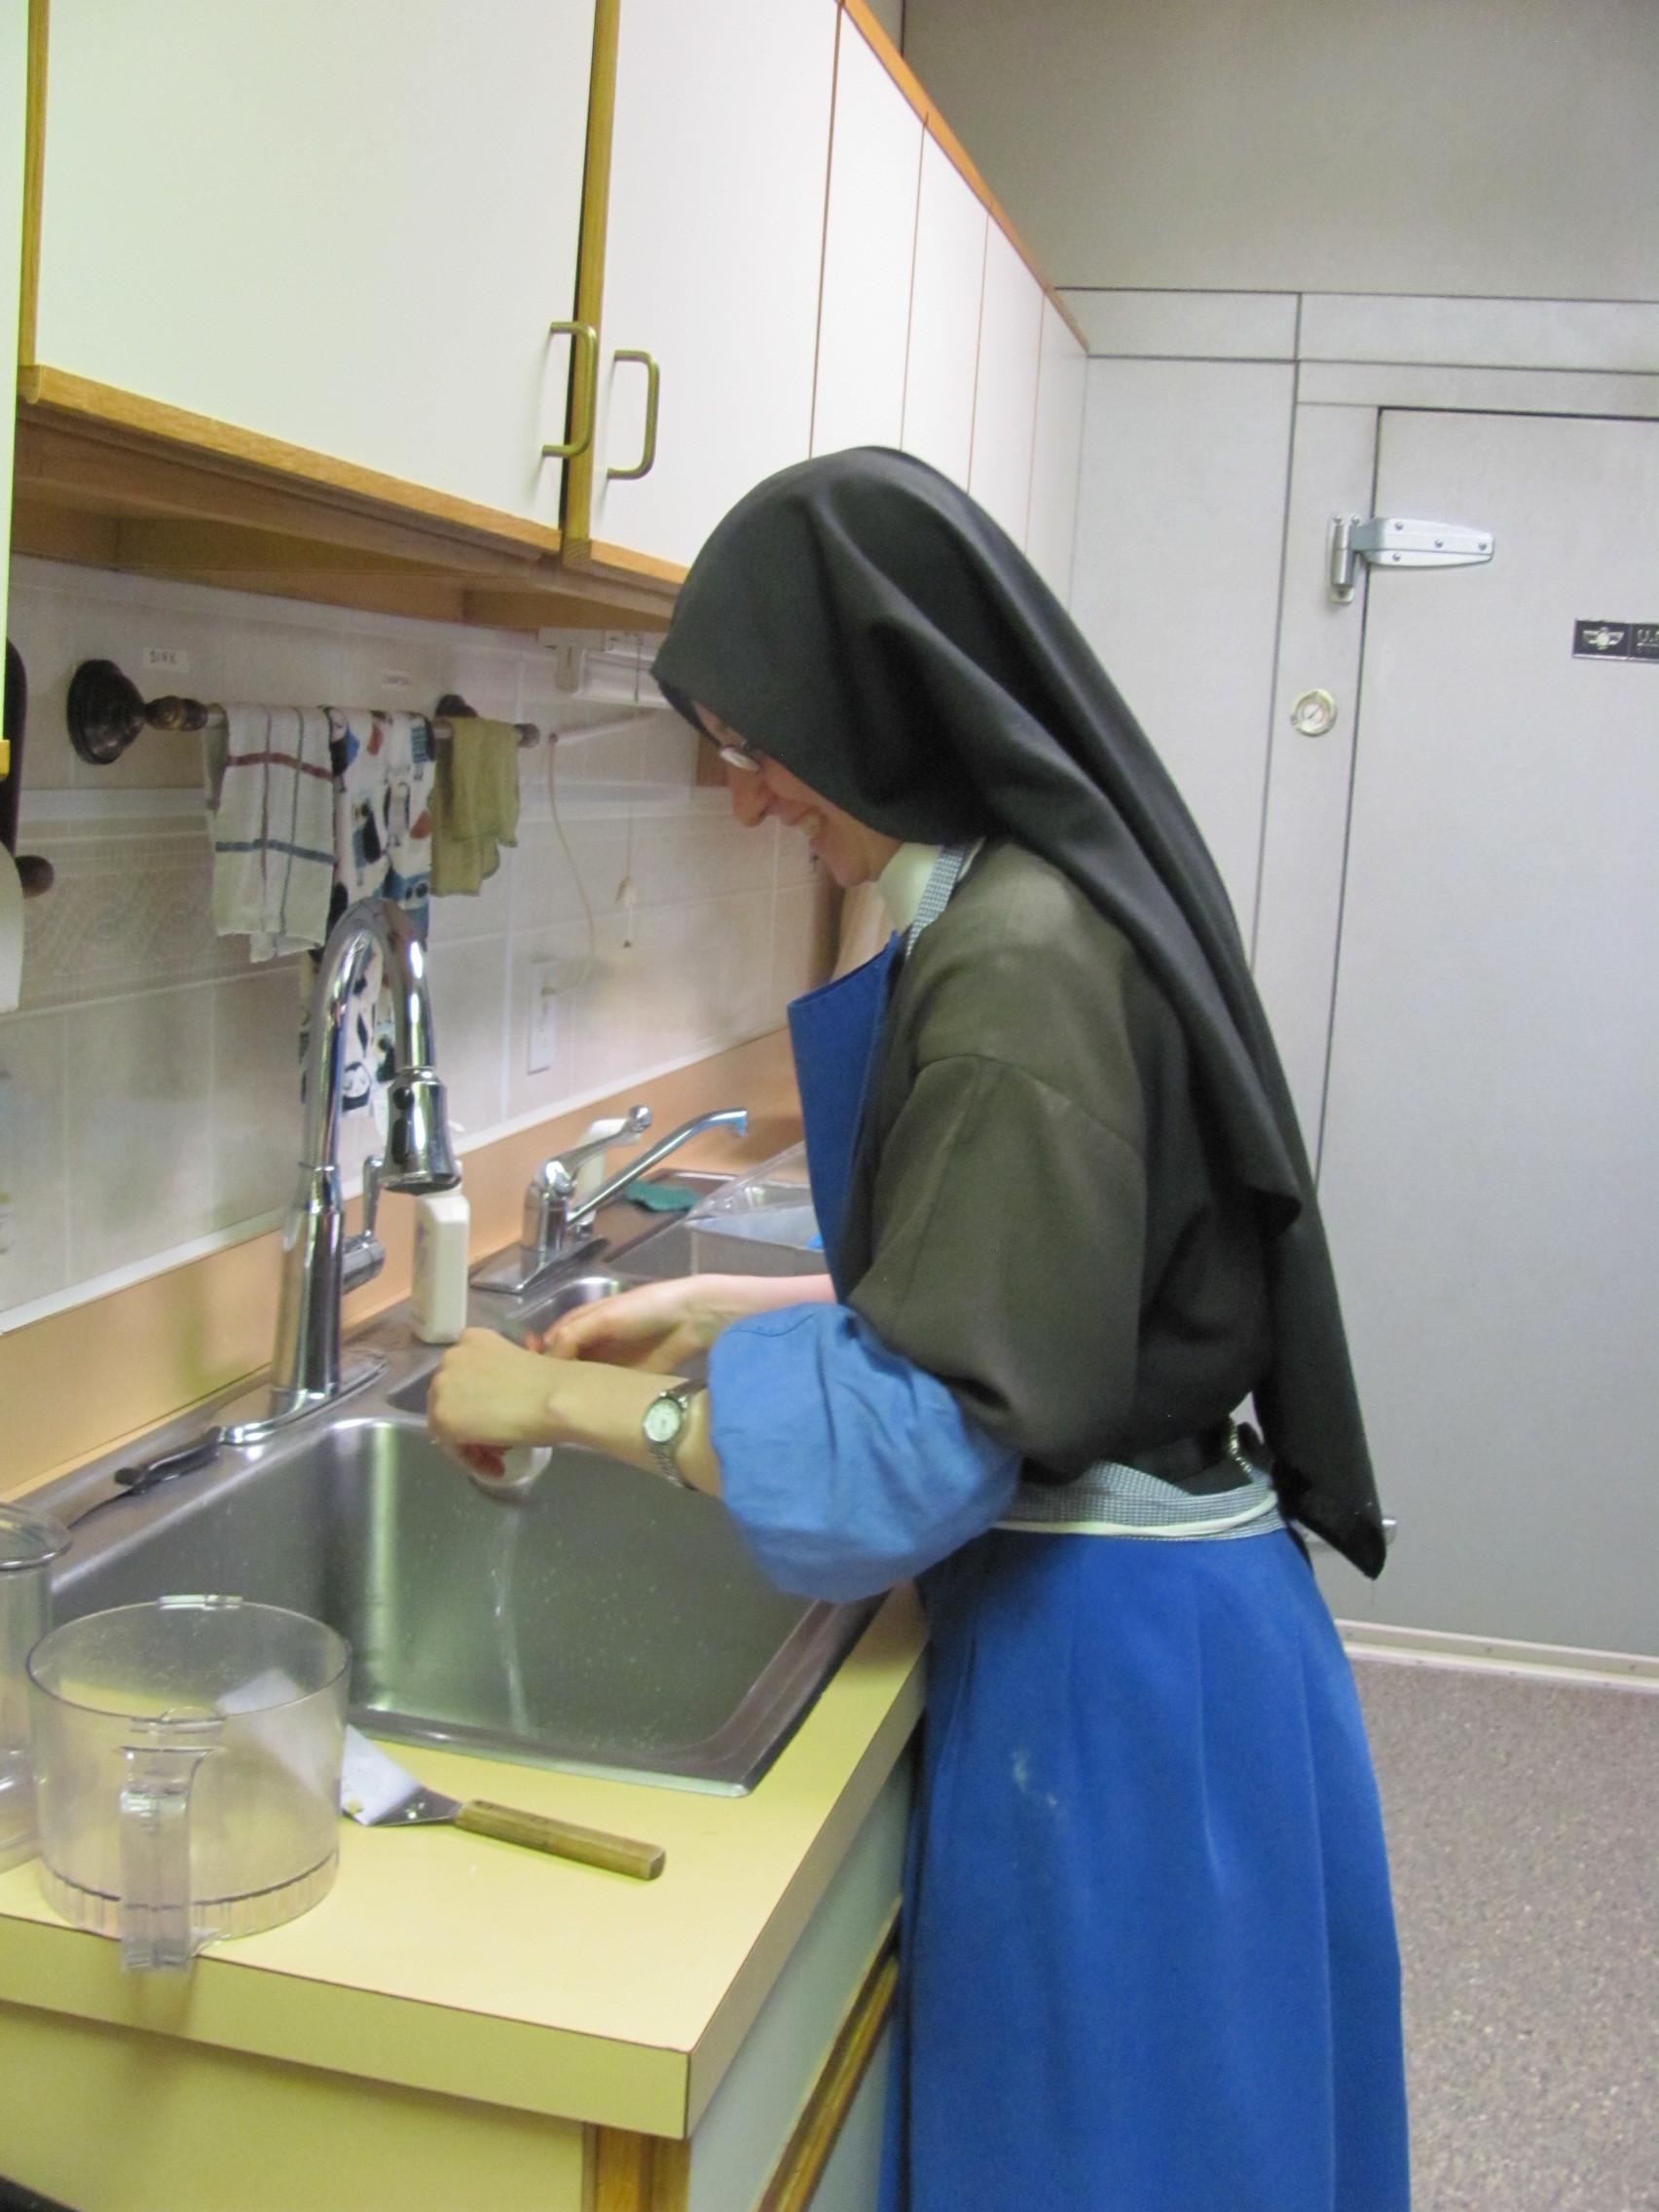 Sr. Frances Marie, our valiant dishwasher!